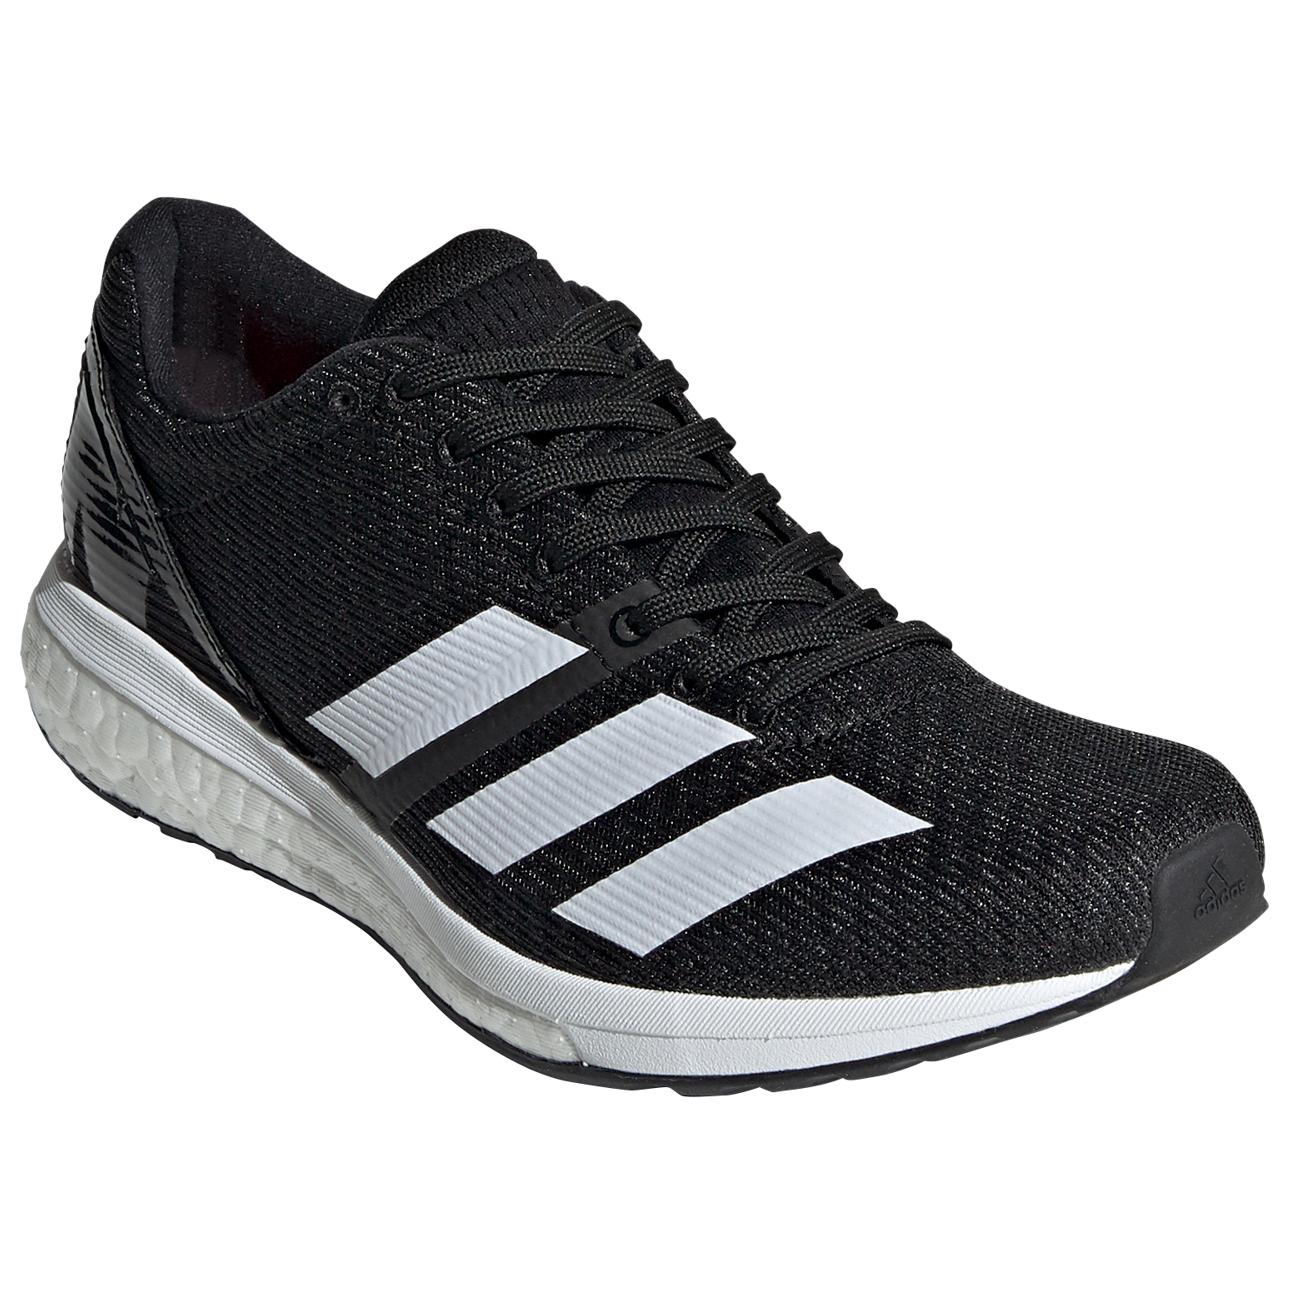 Adidas AdiZero Boston 8 Chaussures de running Femme